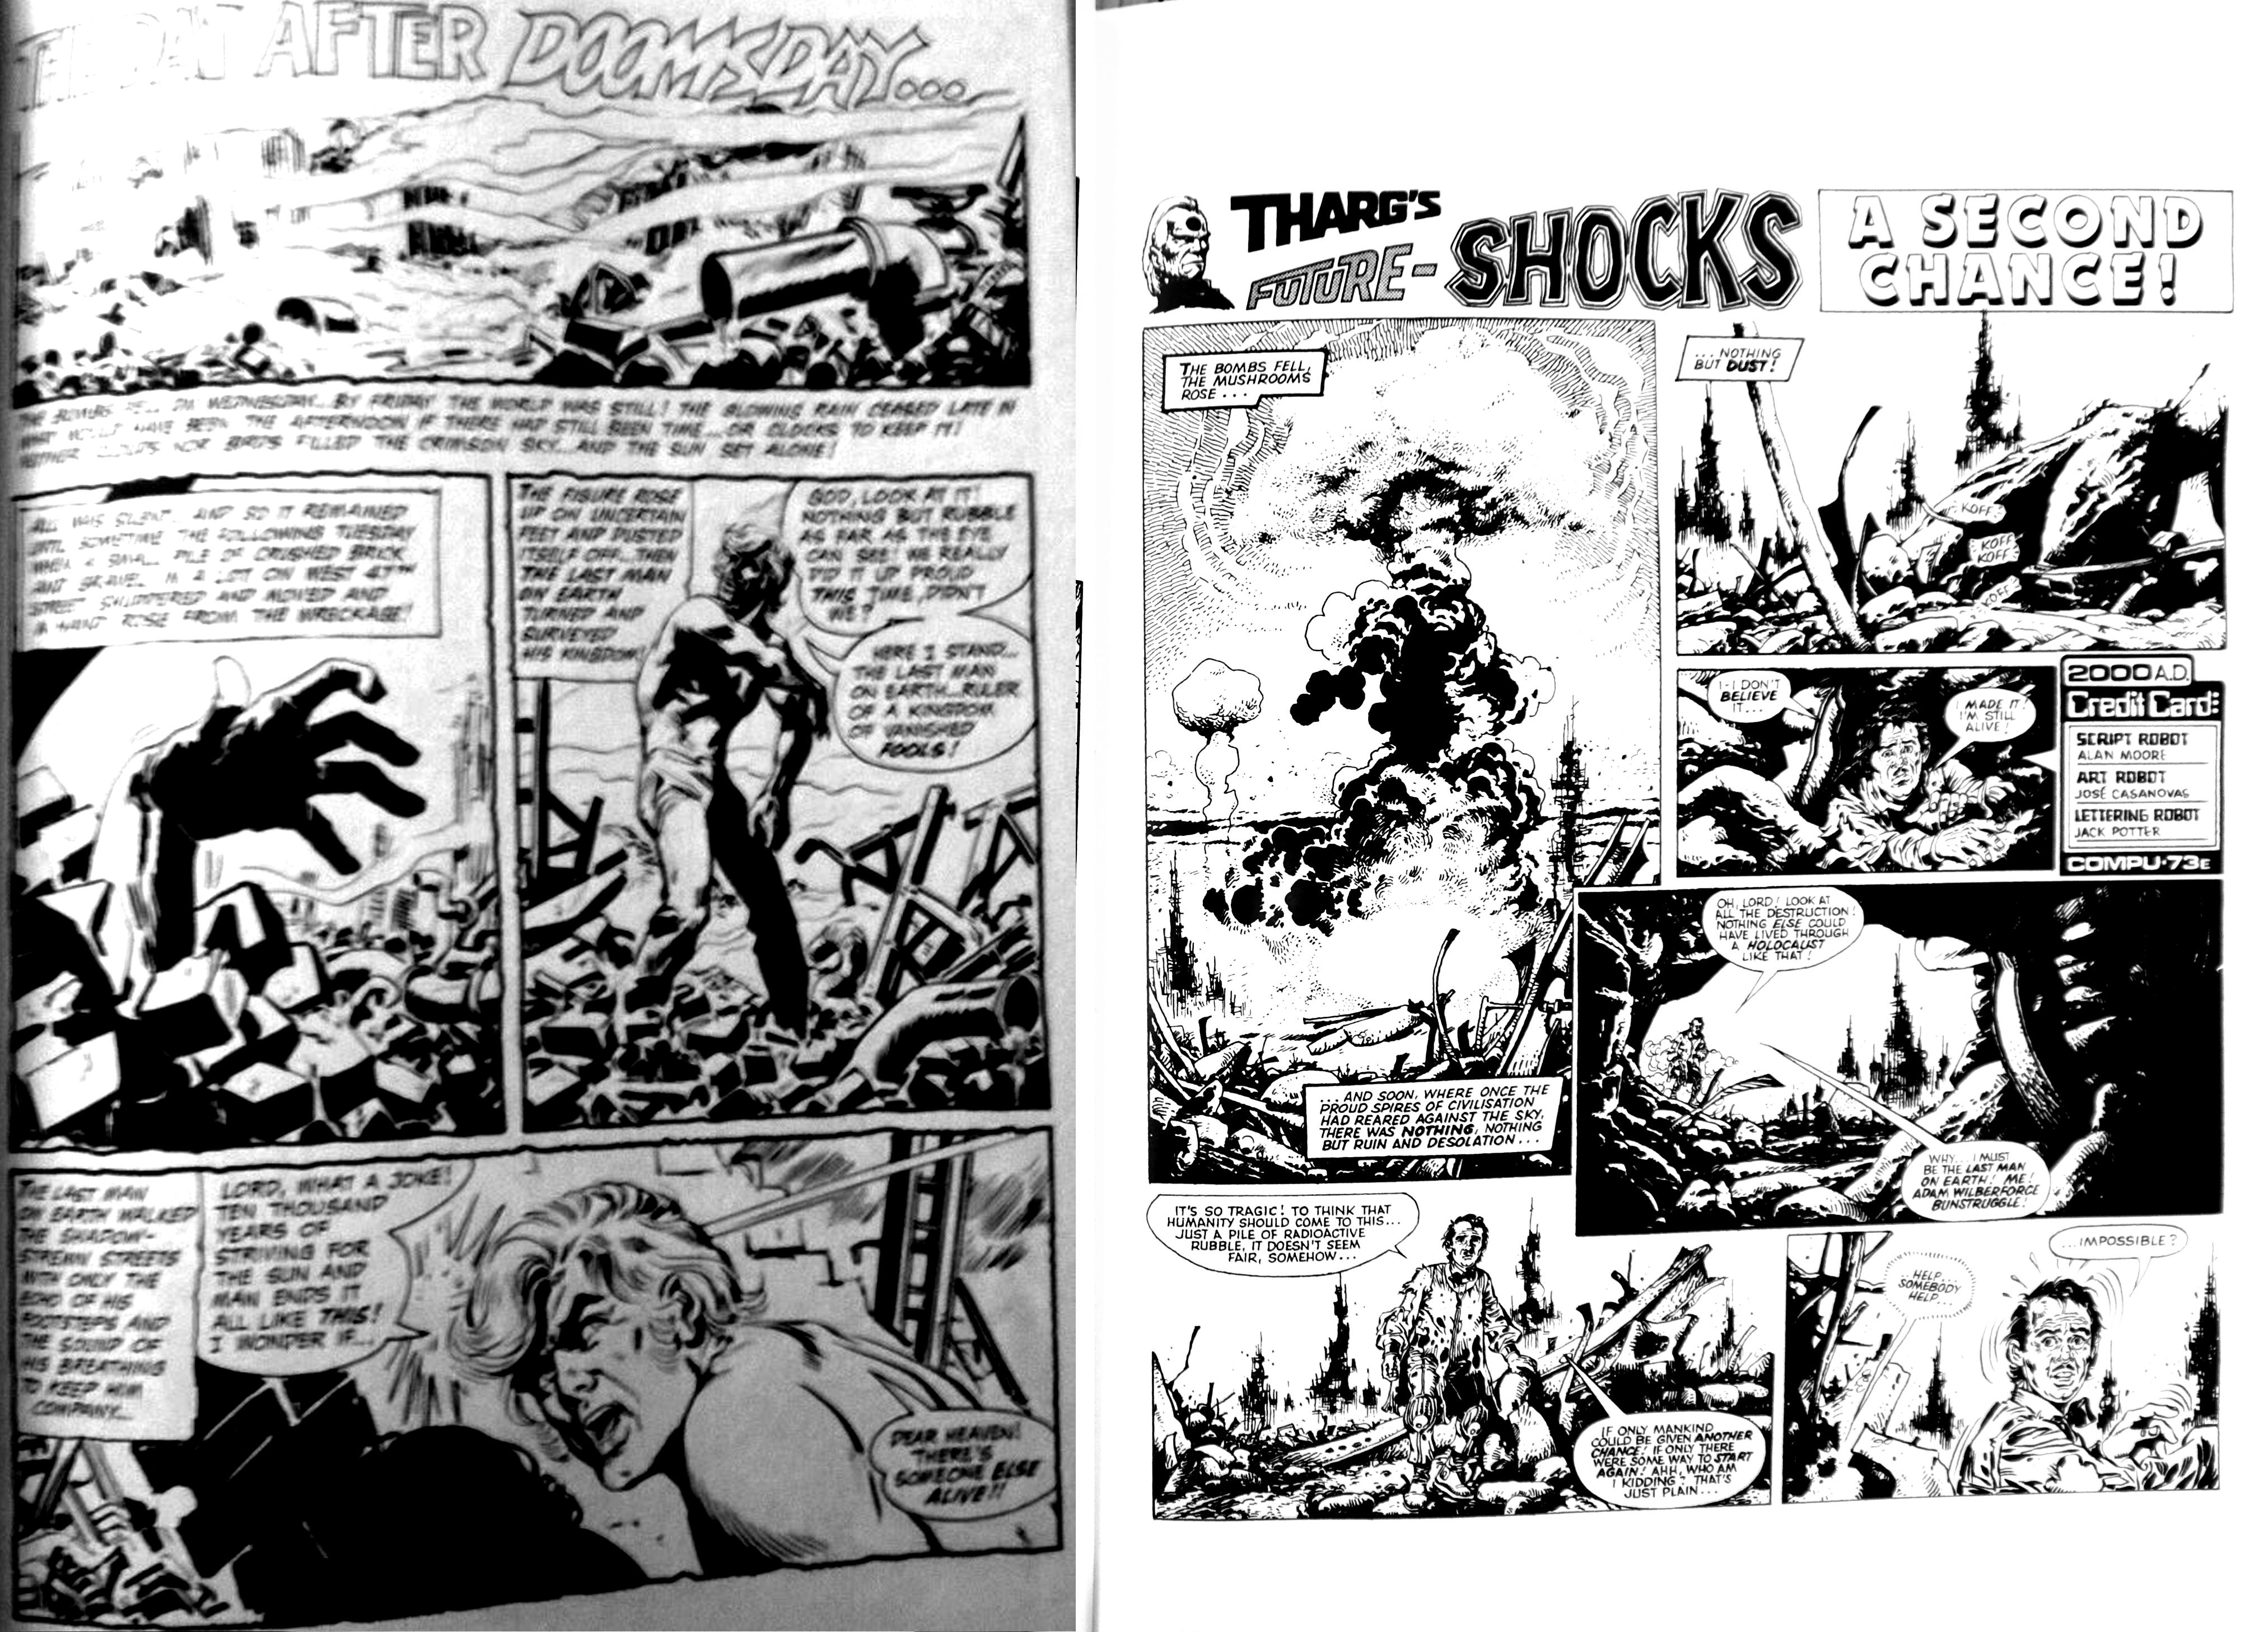 In Analysis: Alan Moore's Future Shocks Part I – Monty Nero